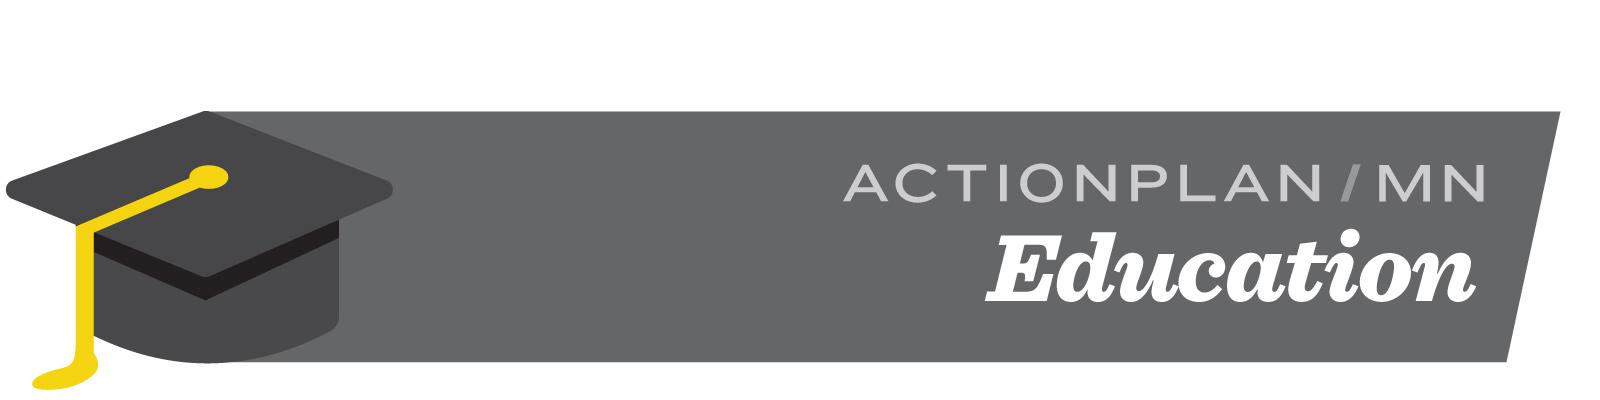 ActionPlanMN-4-Education.jpg